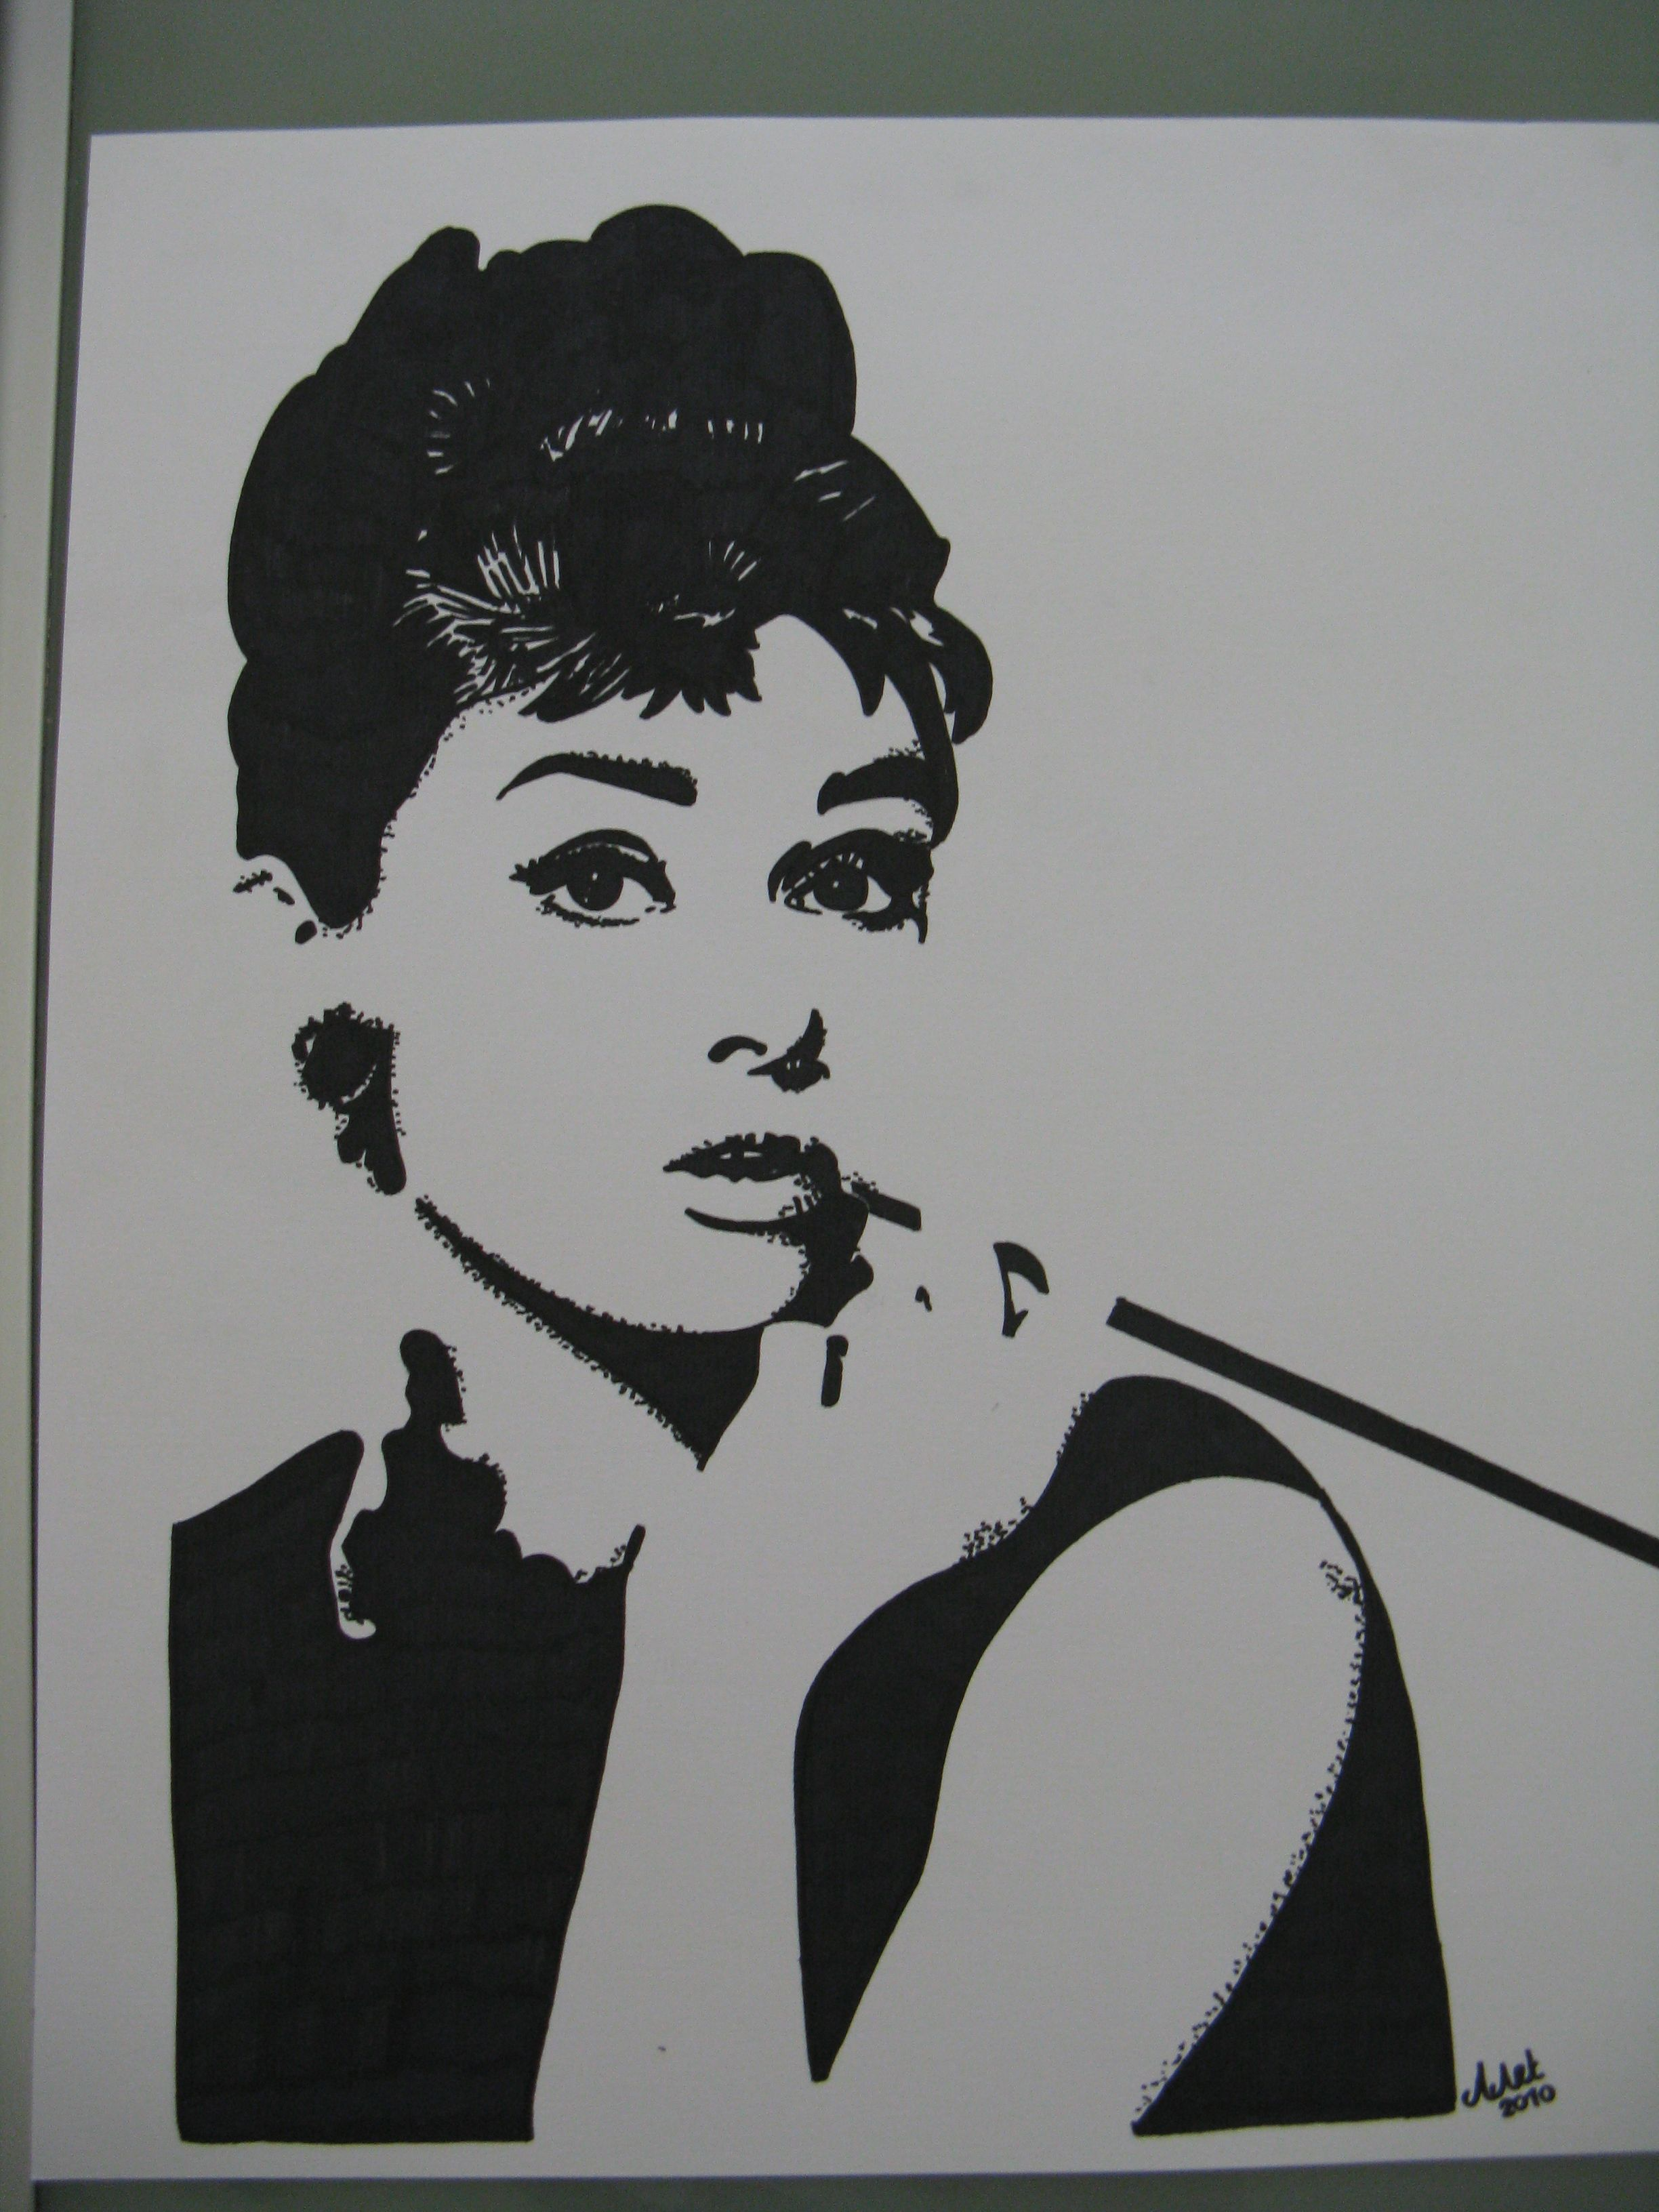 Audrey Hepburn Drawing With Black Marker Pencil Drawings Of Nature Audrey Hepburn Drawing Drawings